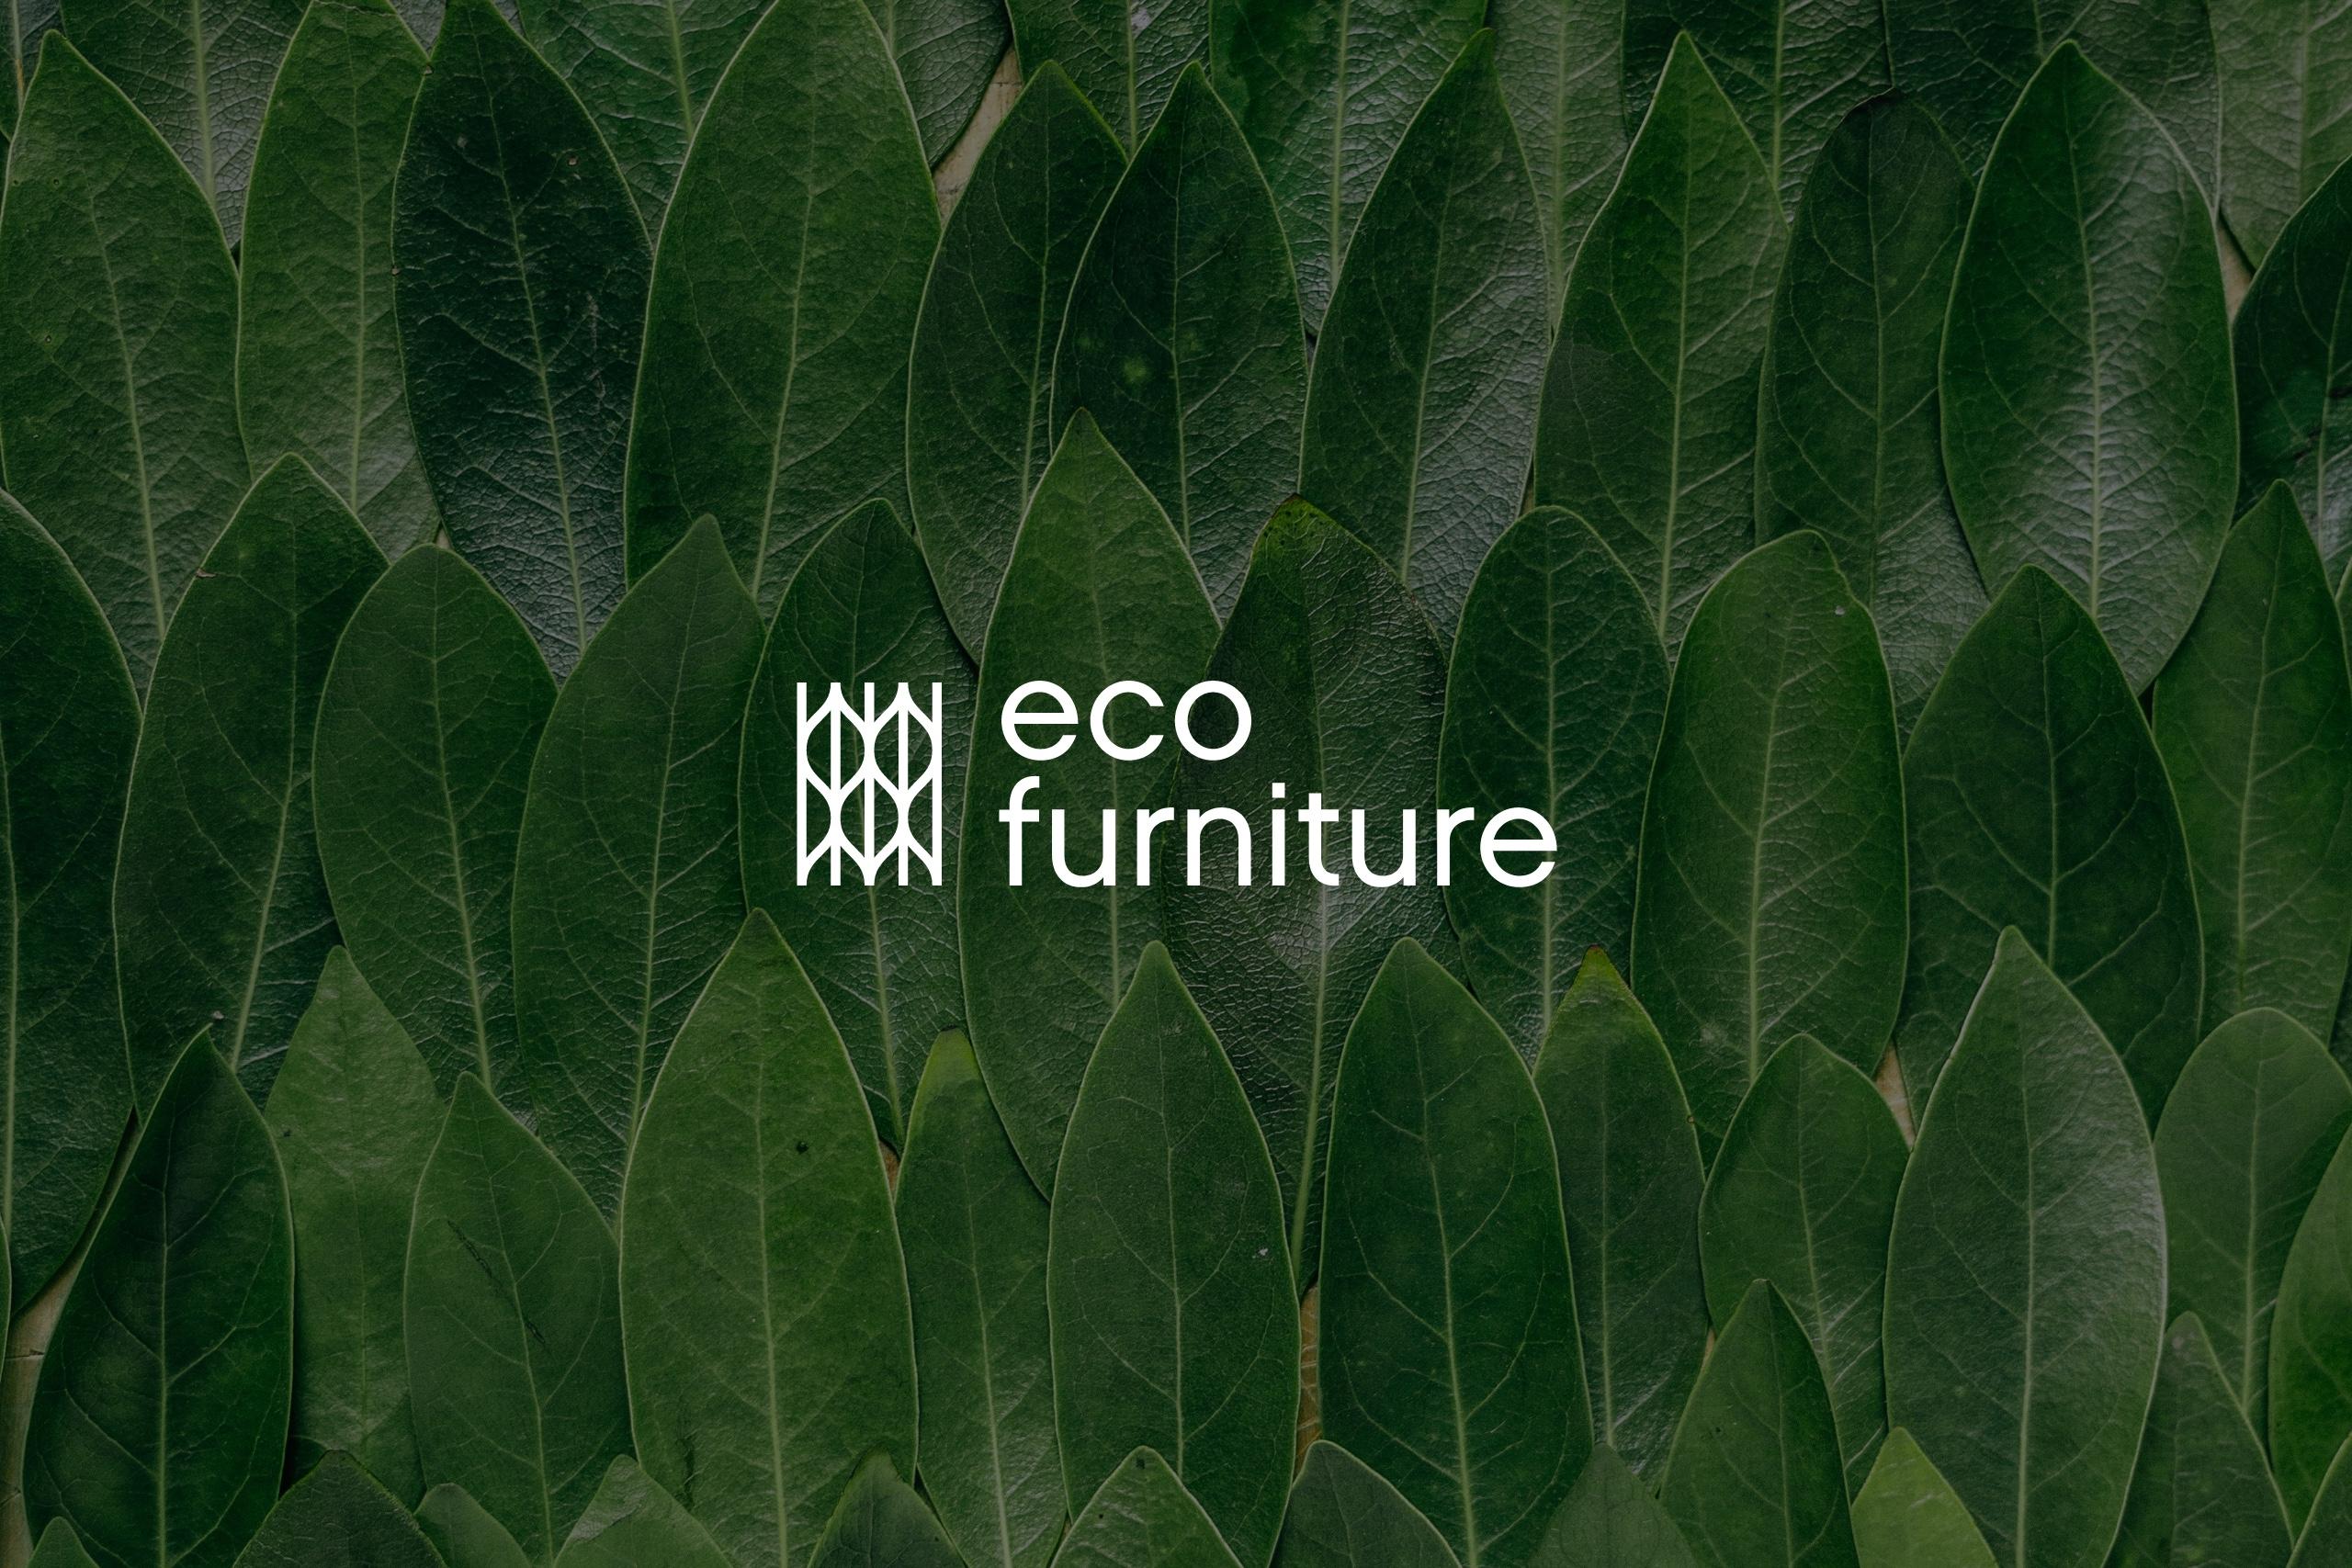 Eco Furniture branding